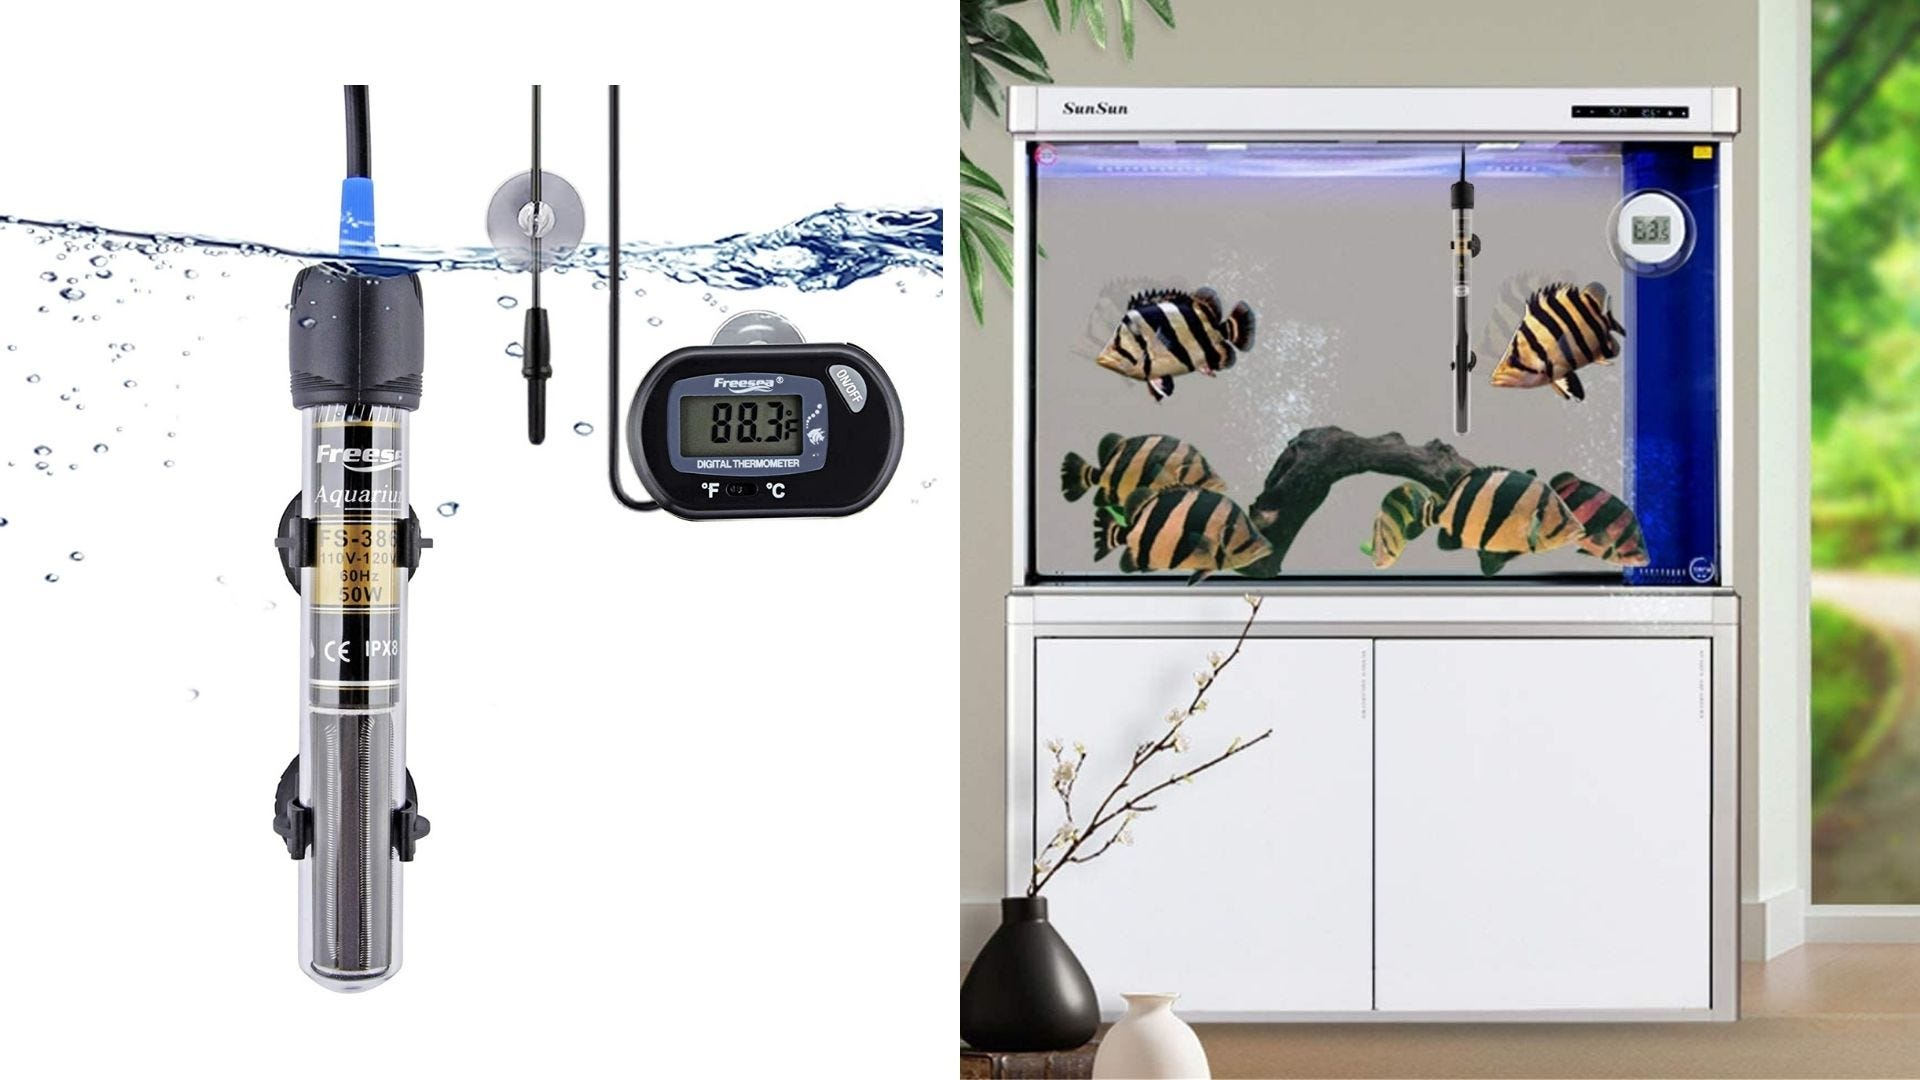 An aquarium heater and several fish swim in an aquarium